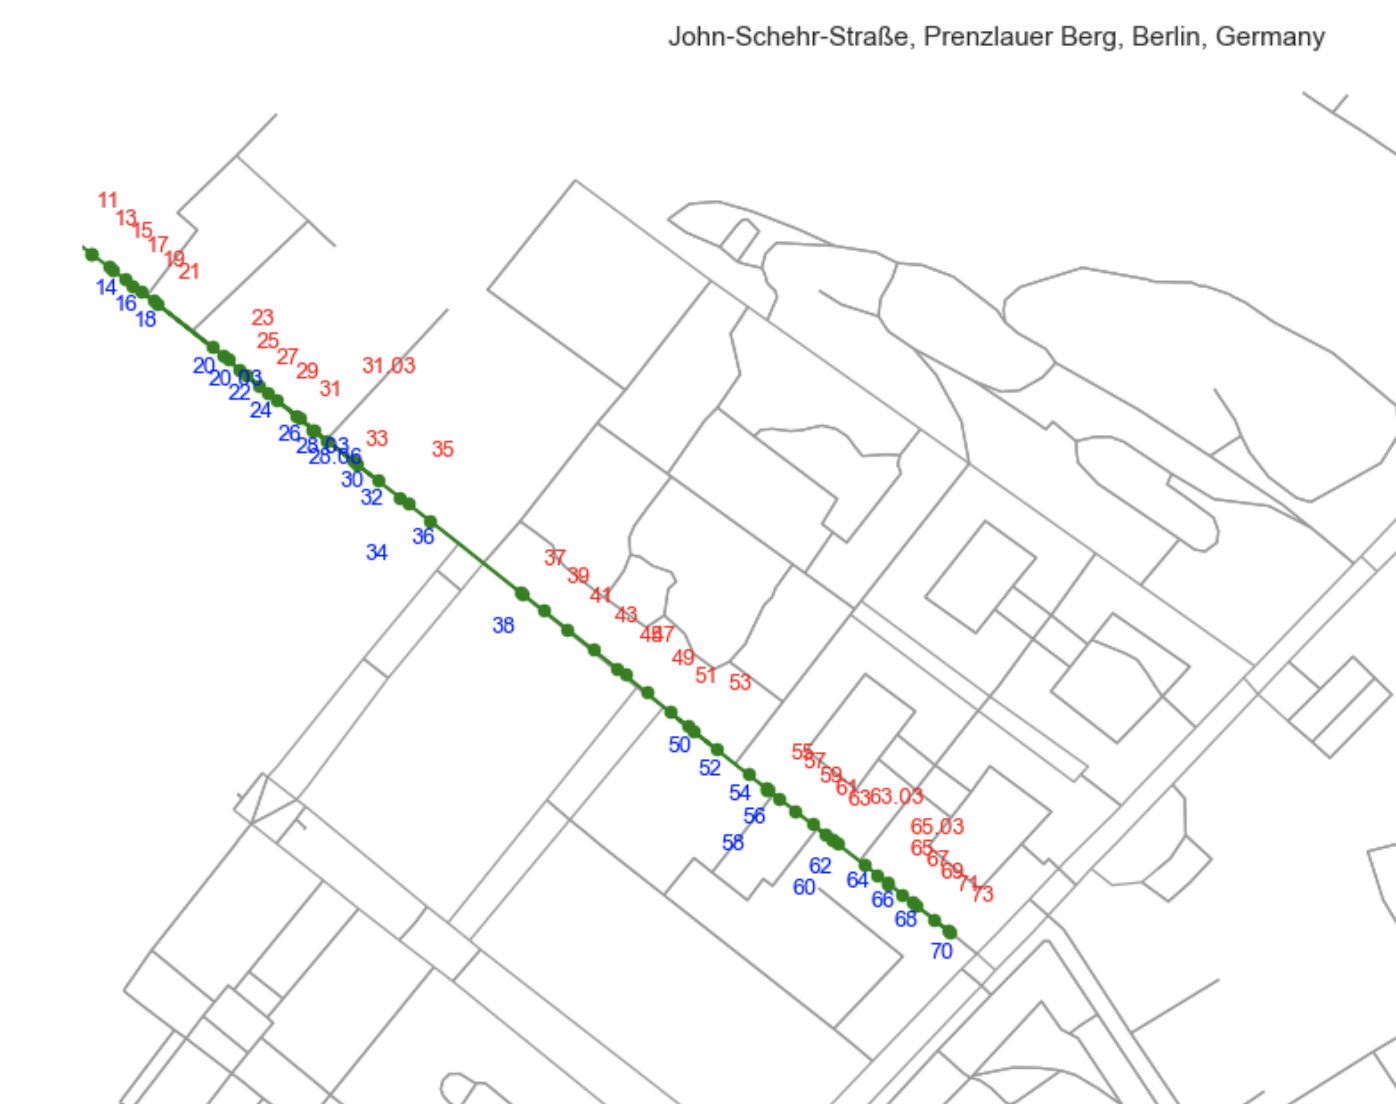 John-Schehr-Straße, Prenzlauer Berg, Berlin, Germany